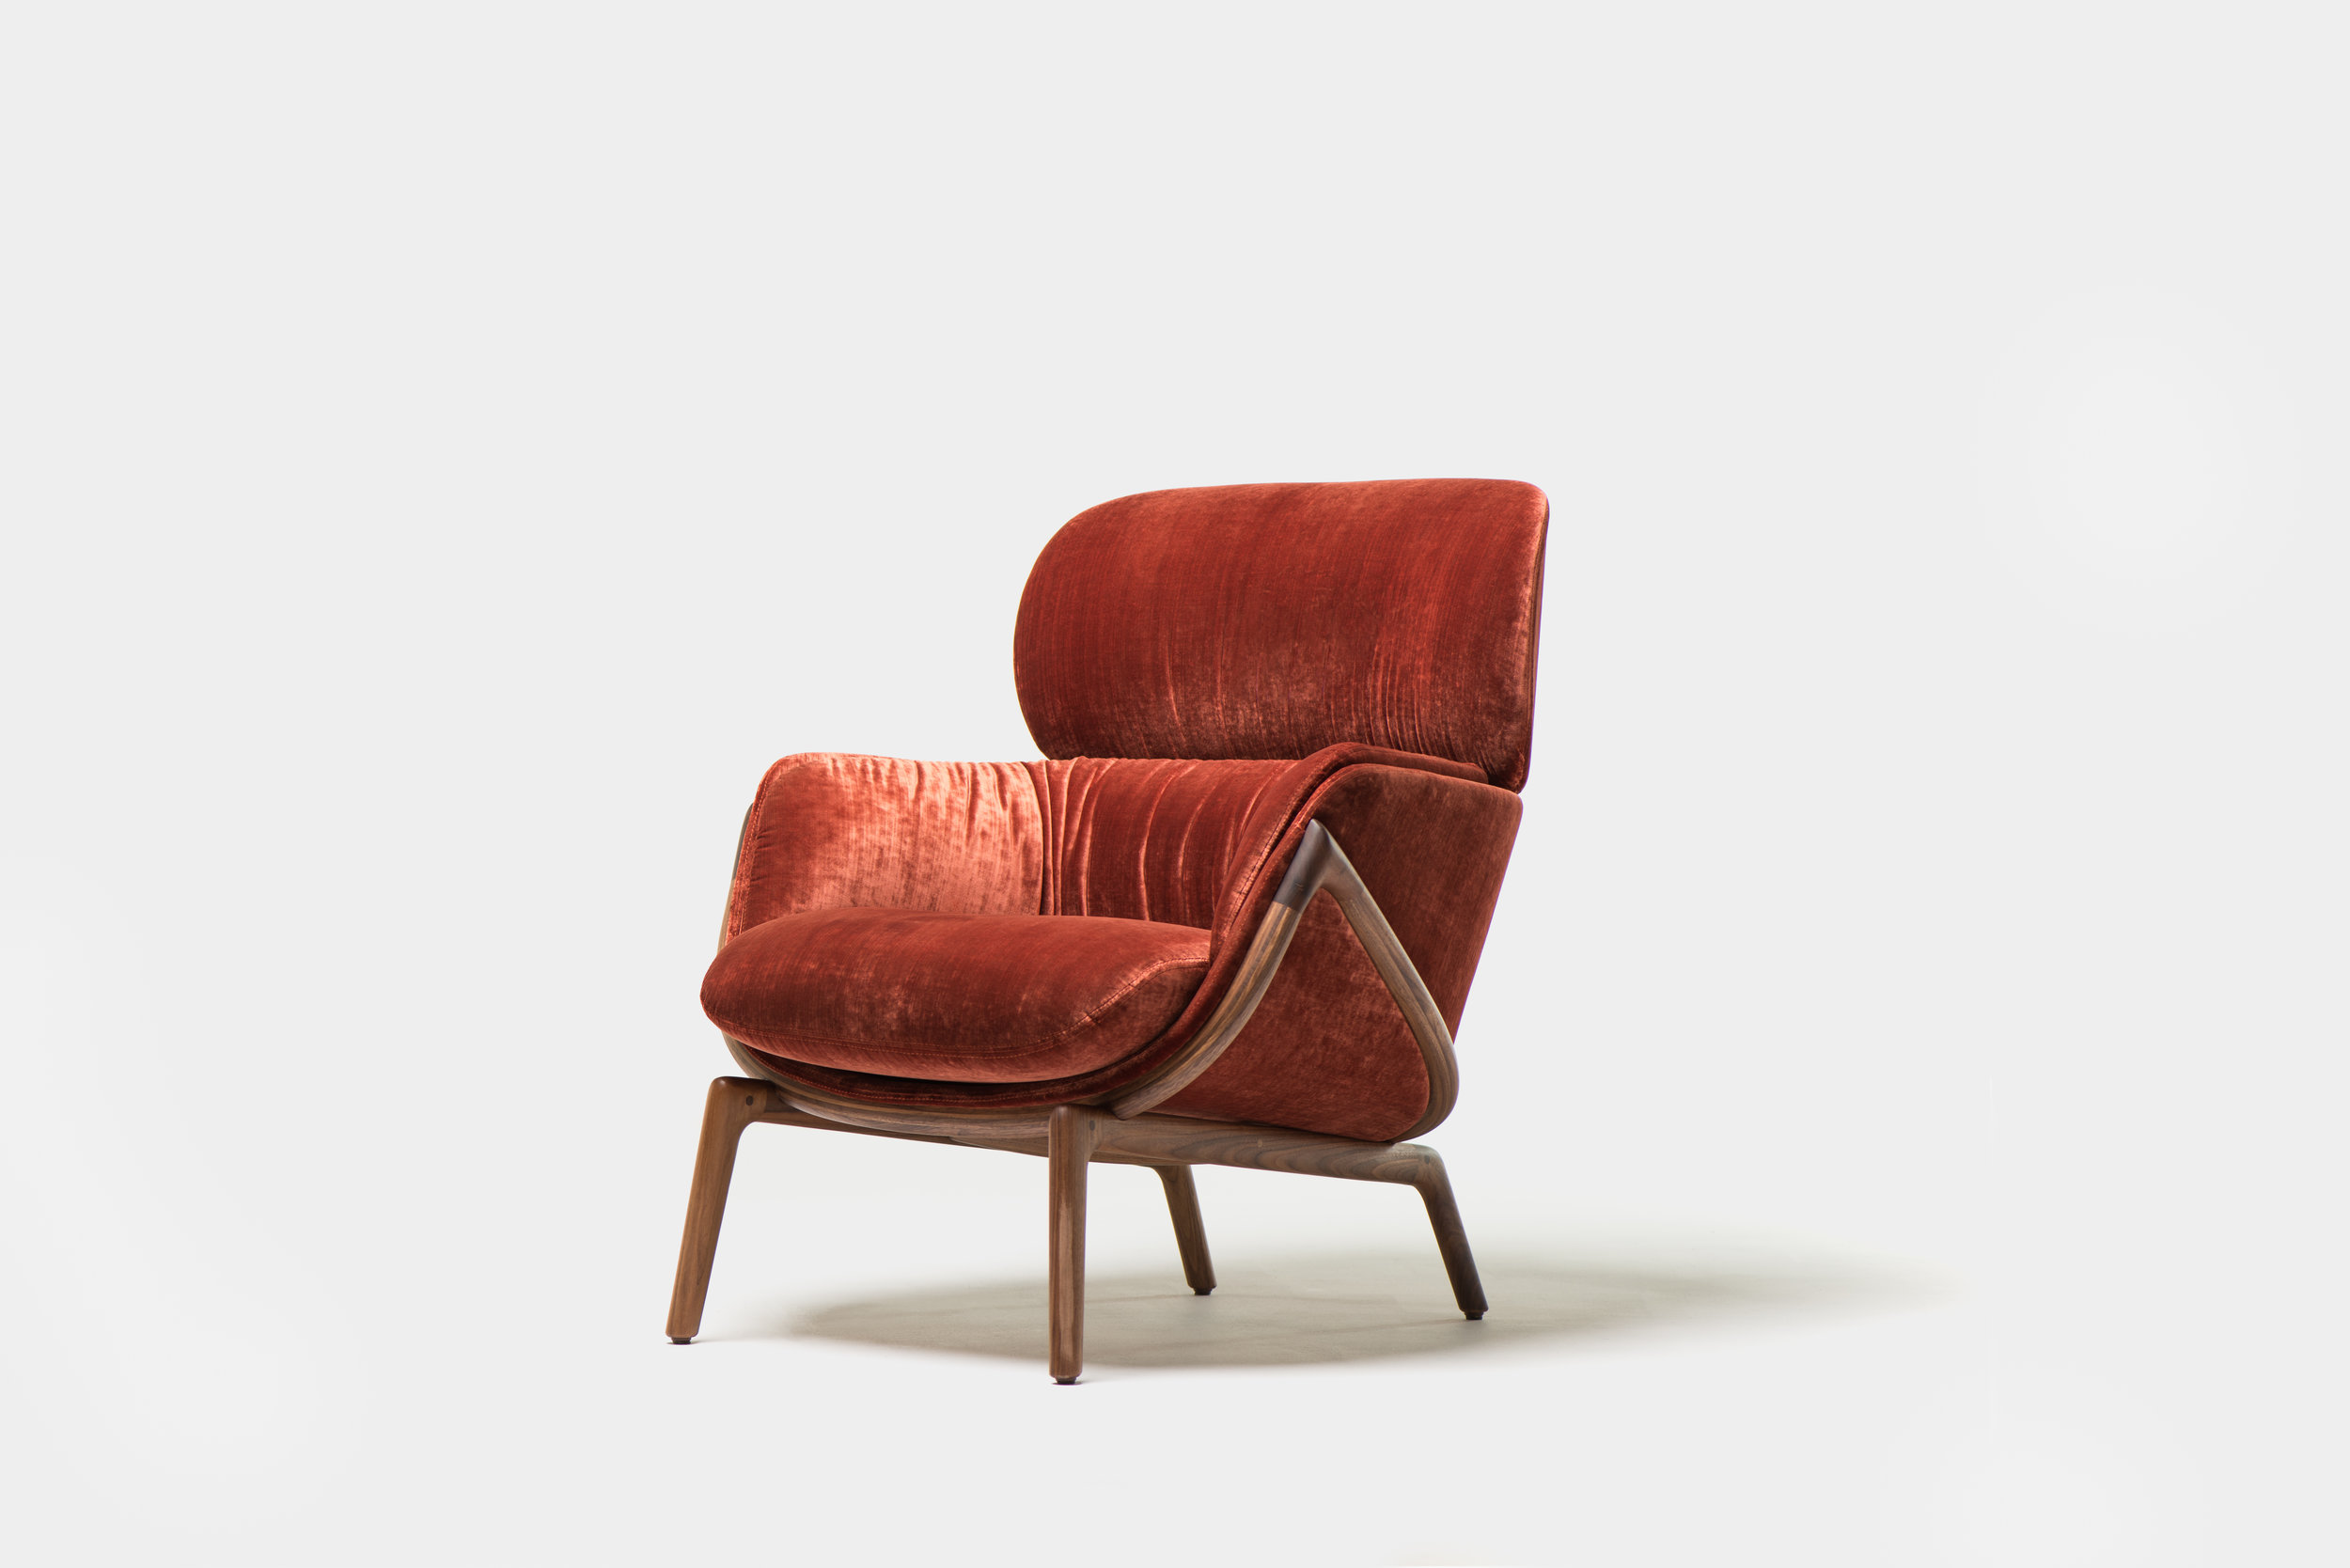 Elysia Lounge chair from DeLaEspada